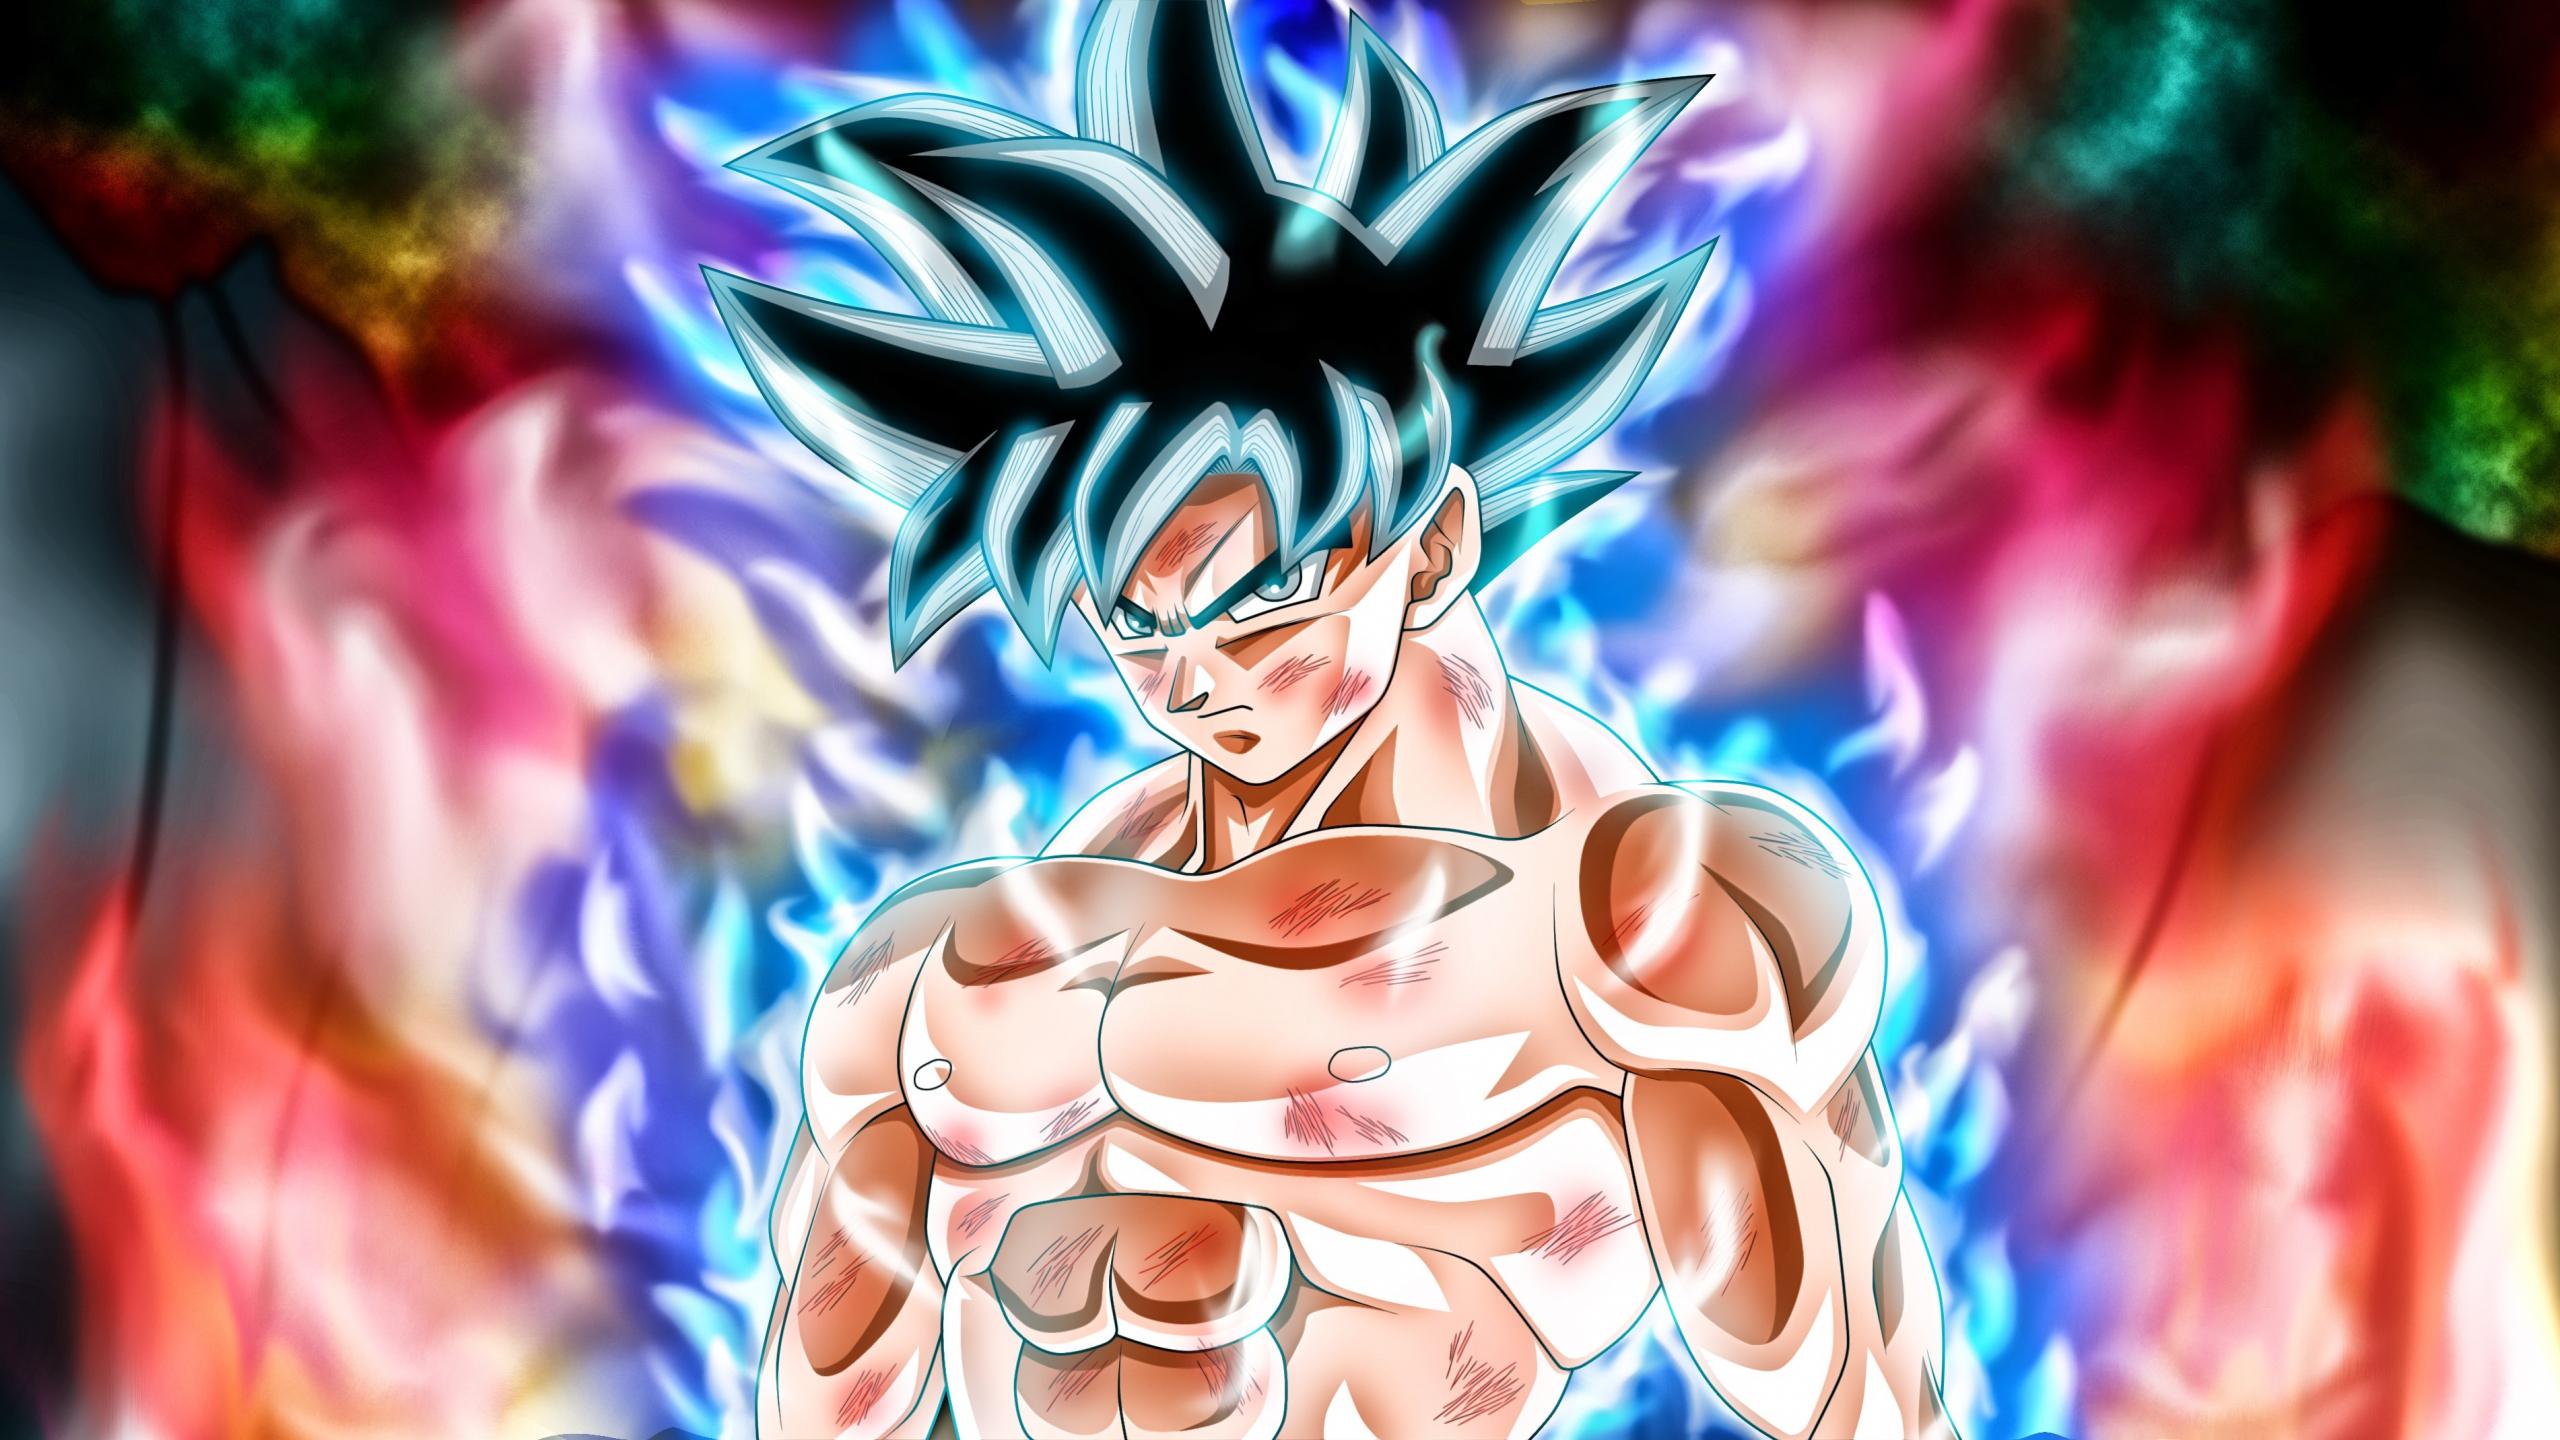 Desktop Wallpaper Goku Anime Anger Dragon Ball Super Hd Image Picture Background 87507e